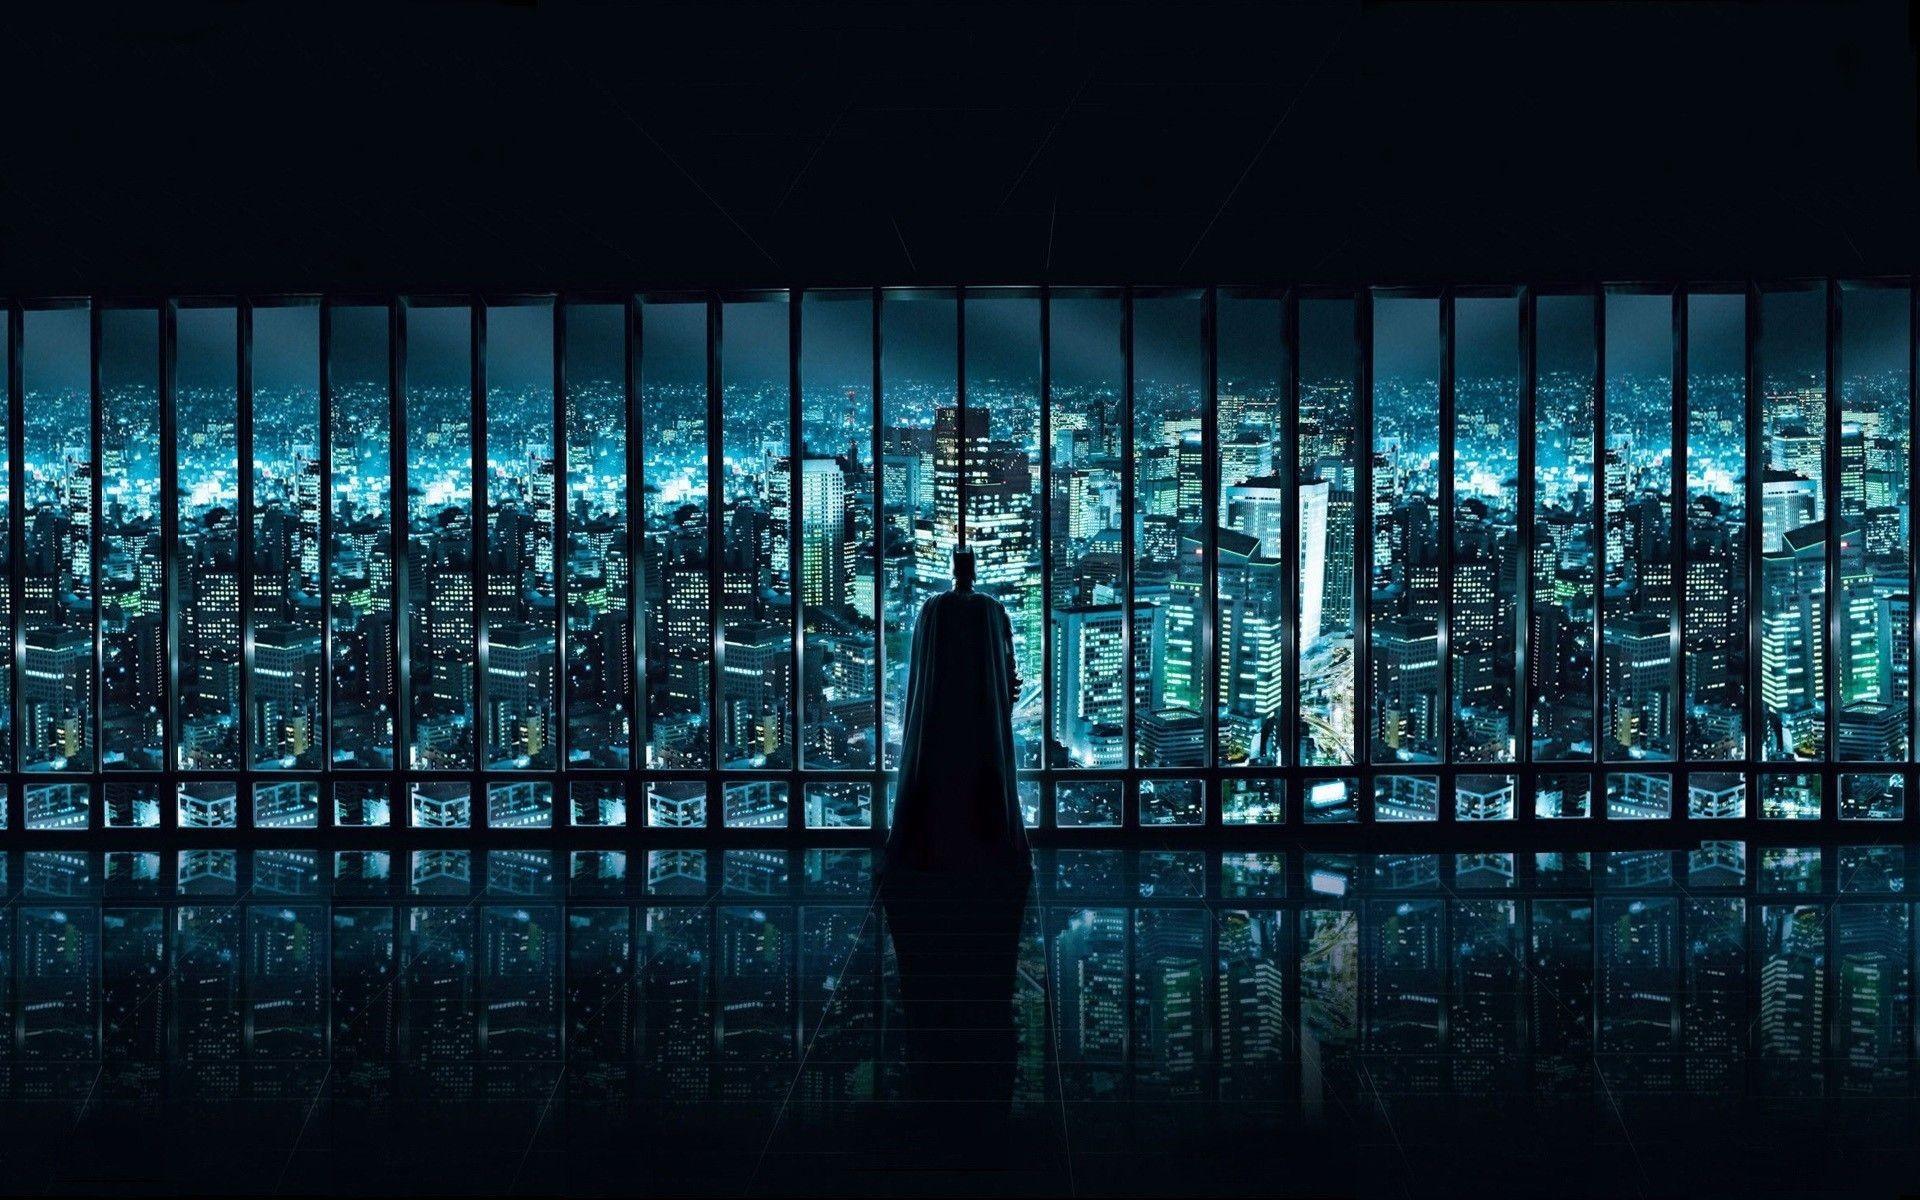 Batman Logo wallpapers For Free Download 1920×1080 Batman Wallpapers (36  Wallpapers) |